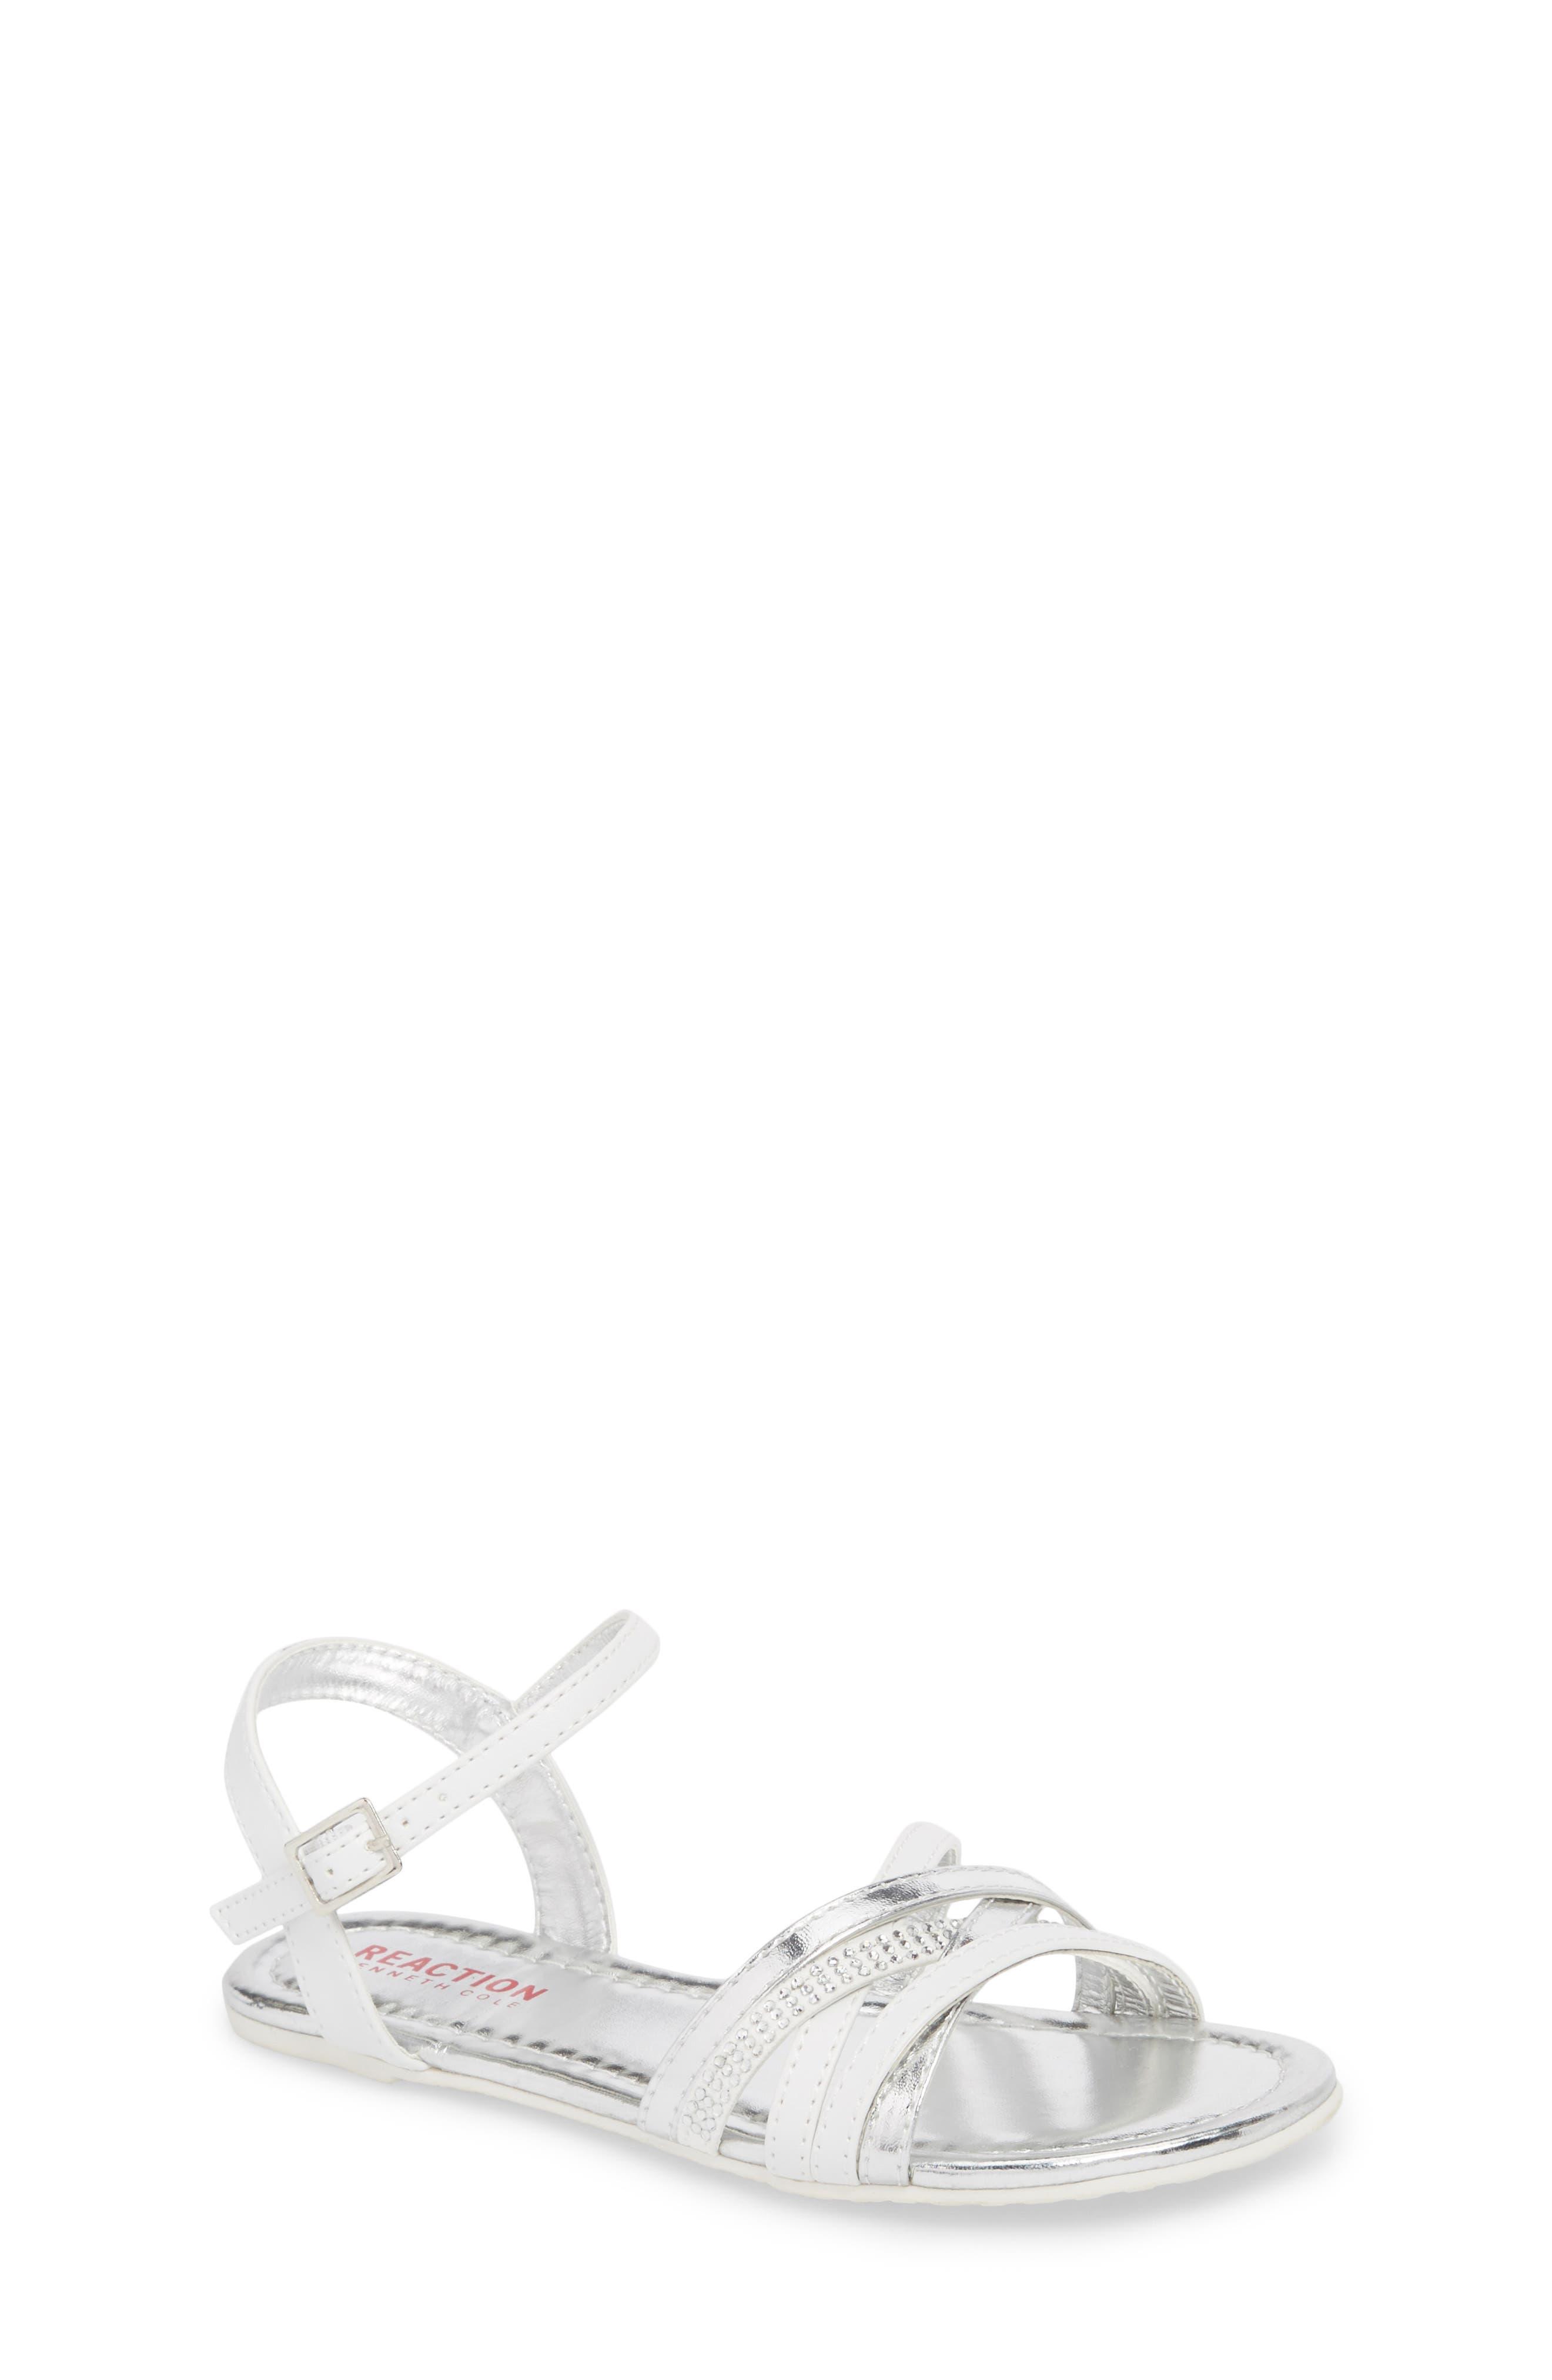 Kenneth Cole New York Kiera Getty Crystal Sandal (Toddler, Little Kid & Big Kid)